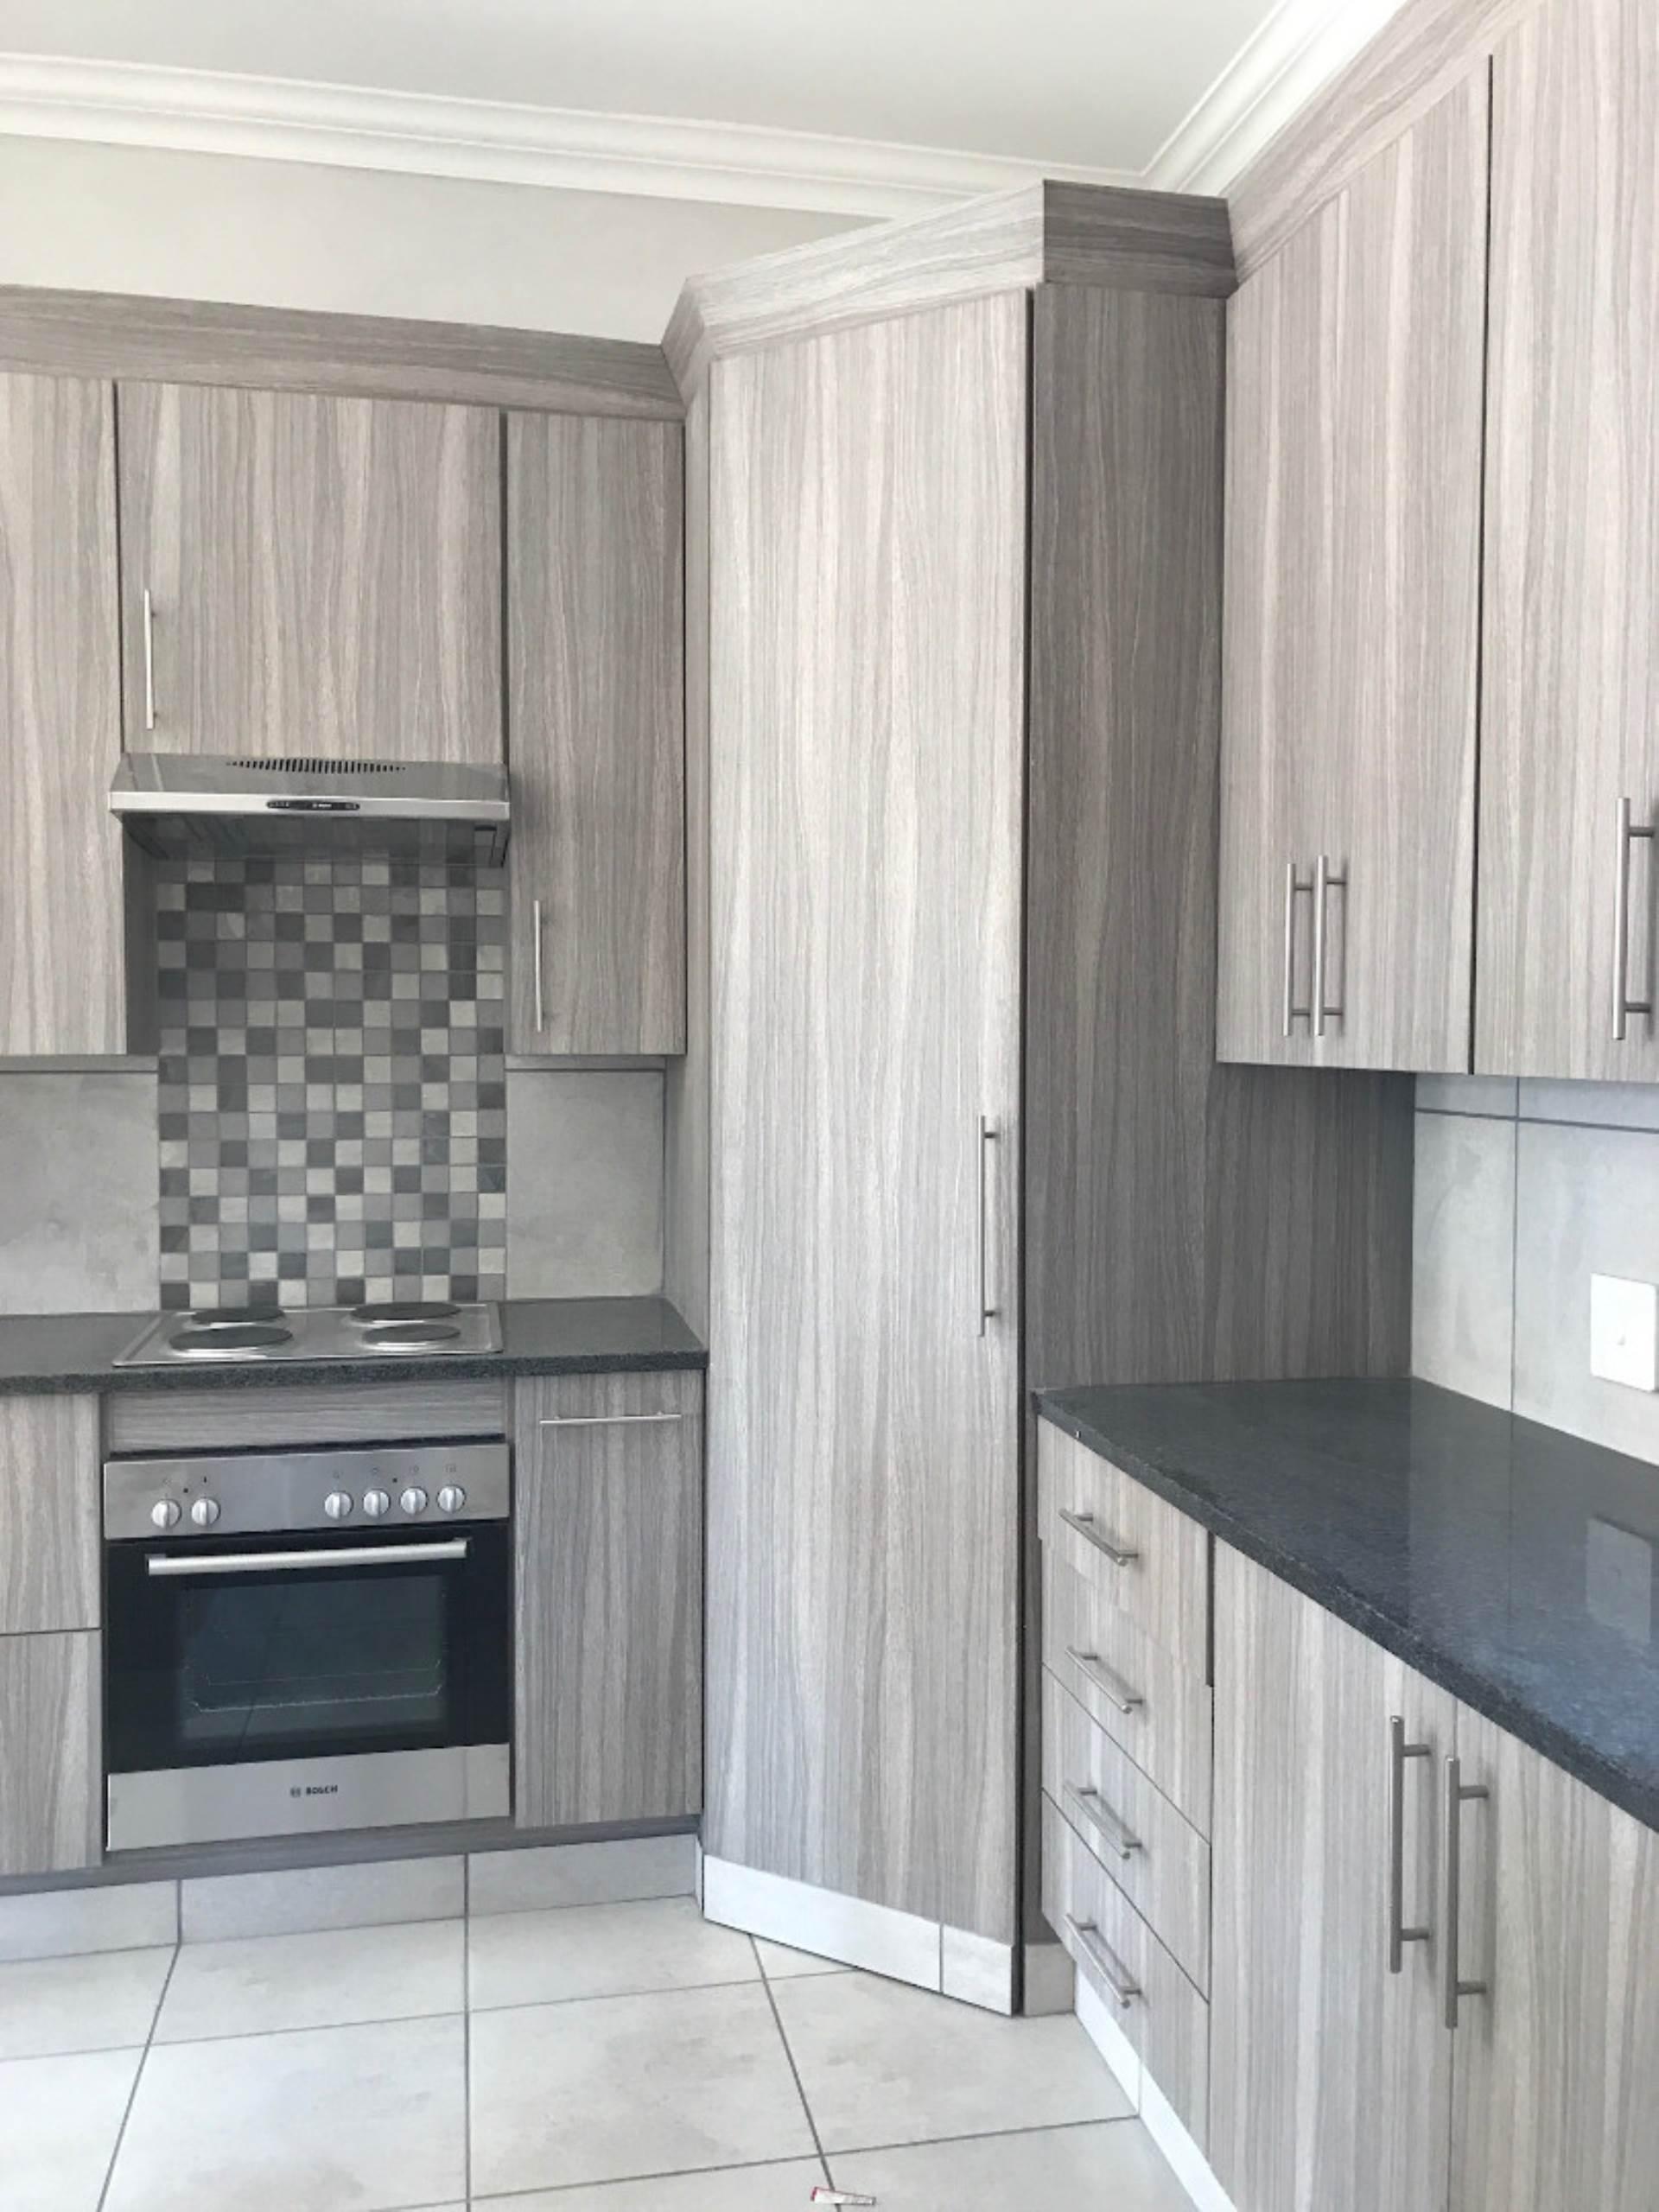 2 BedroomHouse For Sale In Xanadu